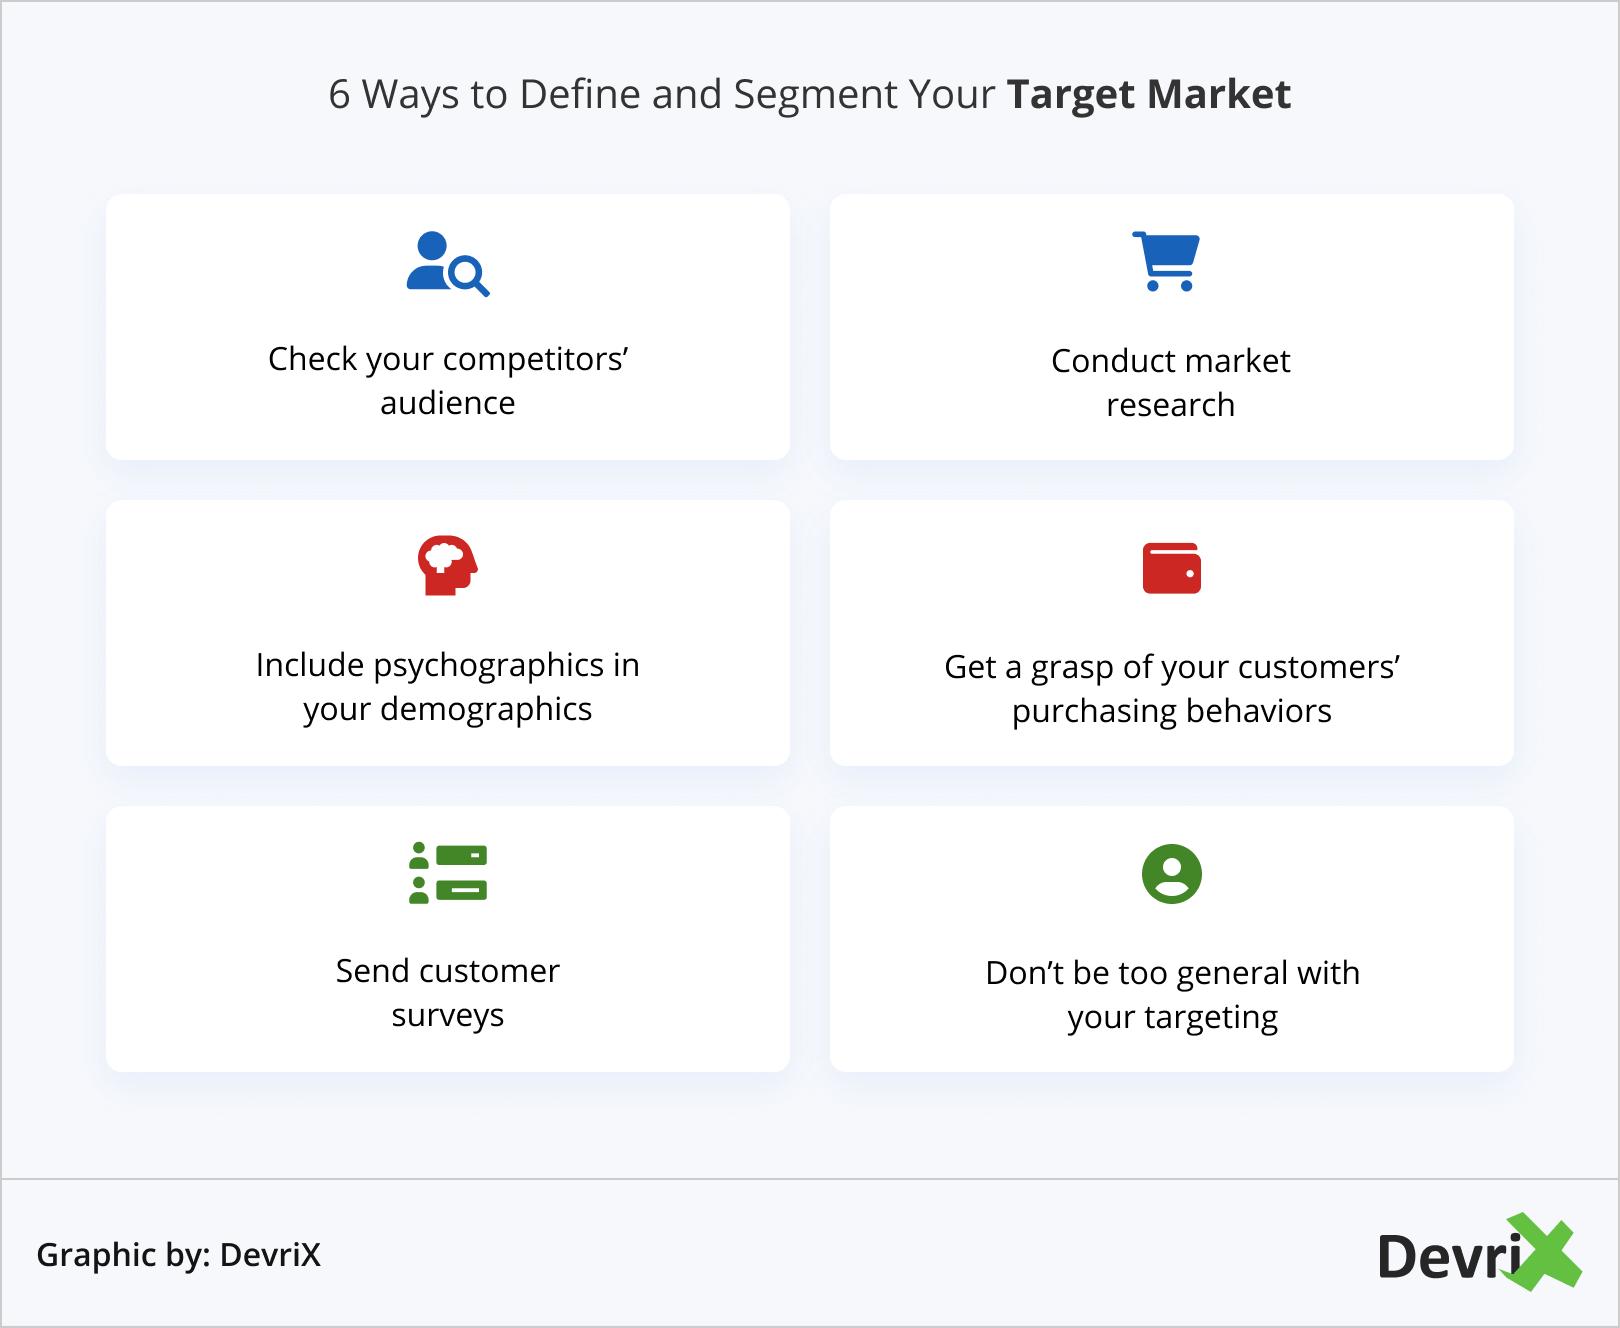 6 Ways to Define and Segment Your Target Market